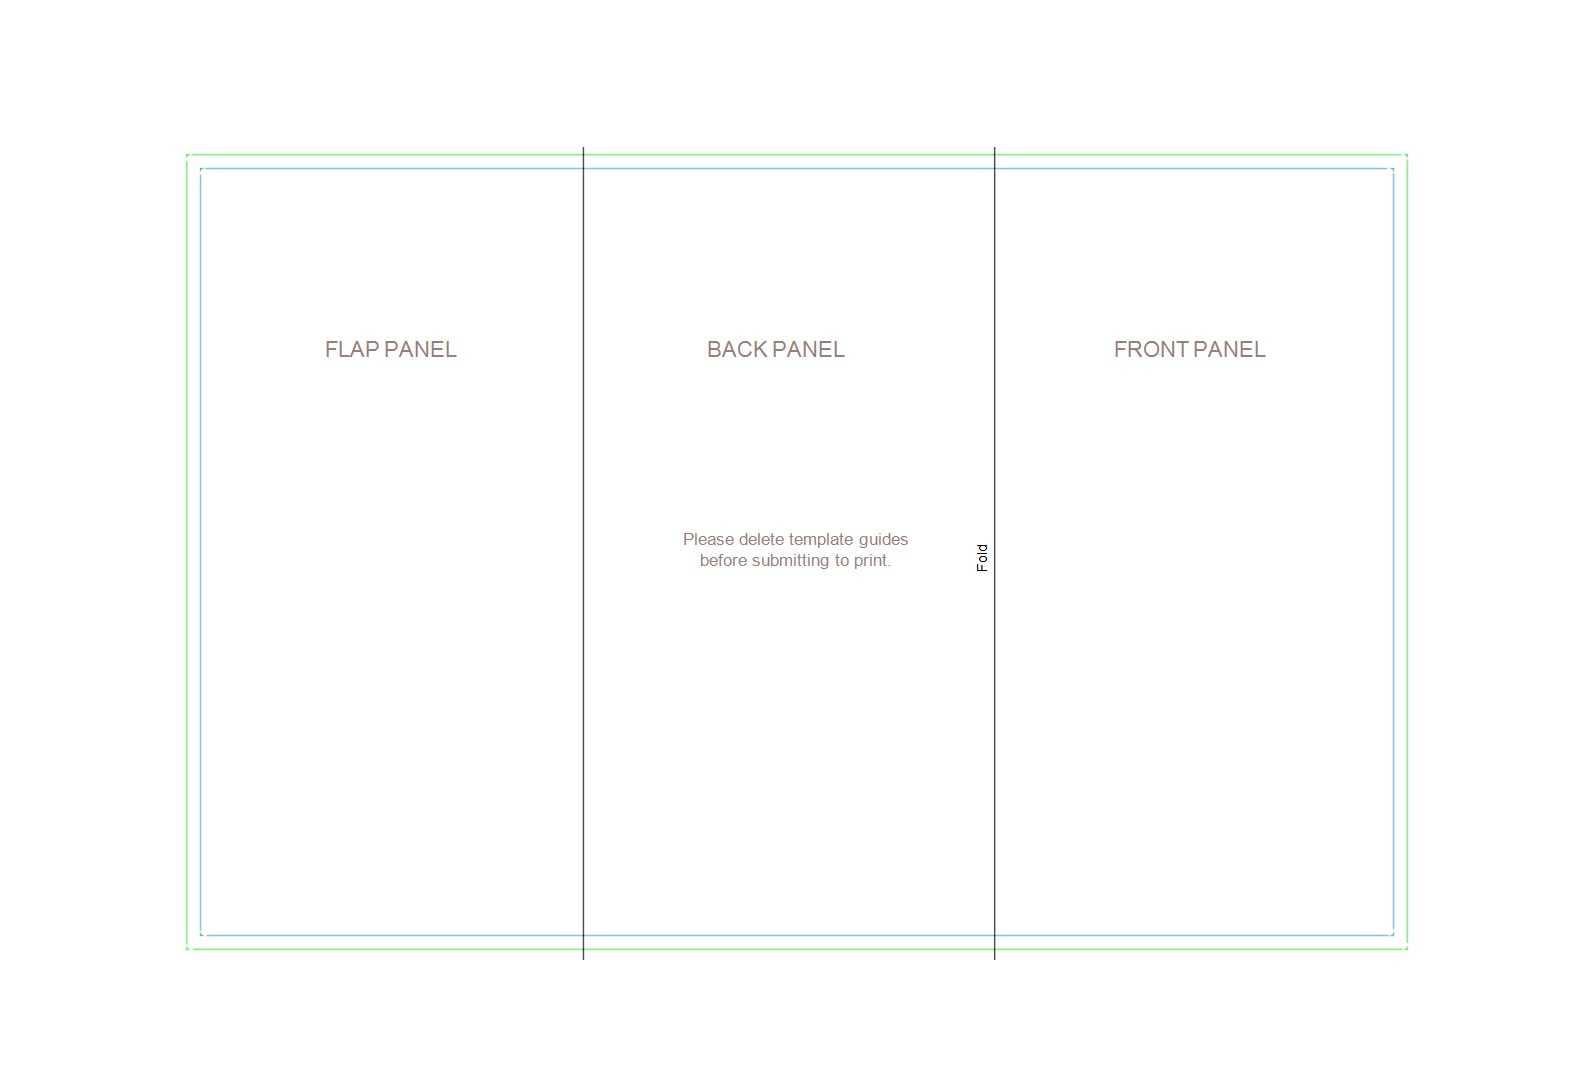 023 Free Tri Fold Template Google Docs Ideas Brochure Throughout Brochure Template Google Docs